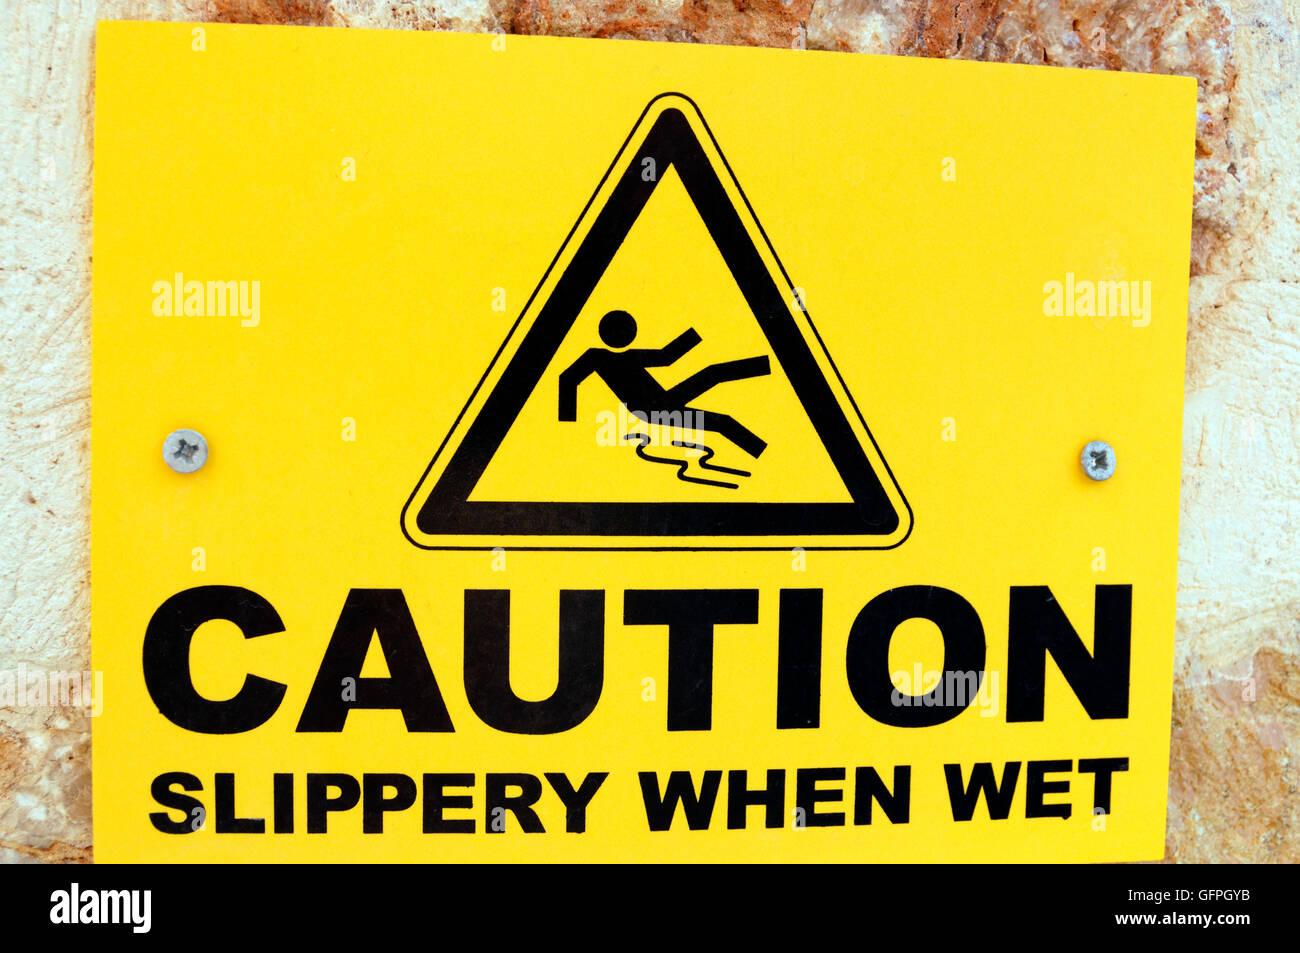 Warning sign for slippery surface, Kisla, Kalkan, Turkey. - Stock Image